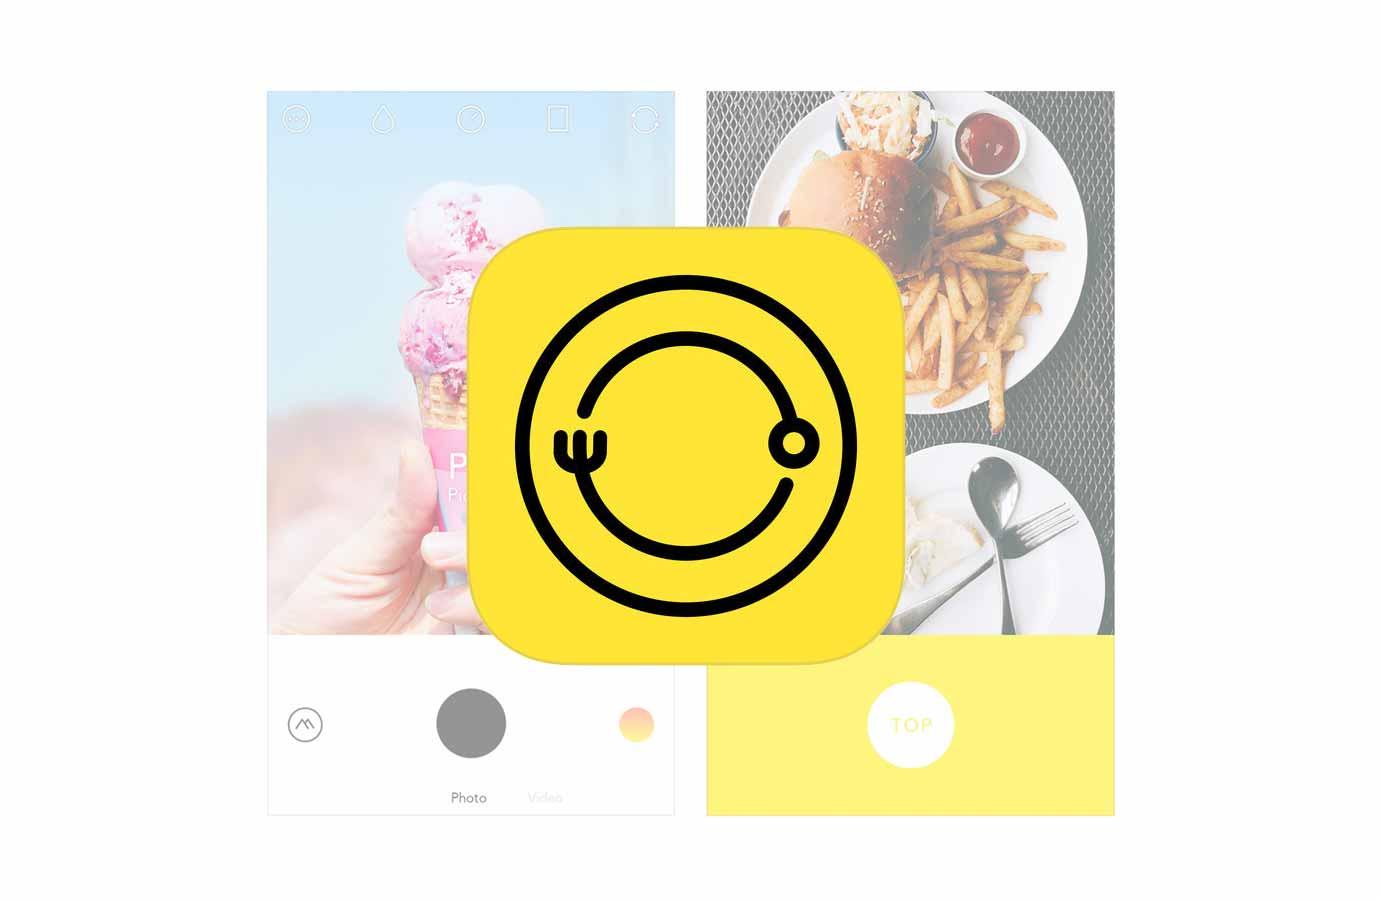 LINE、新フィルターセットを追加した食べ物の撮影に特化したカメラアプリ「Foodie 1.6.0」リリース